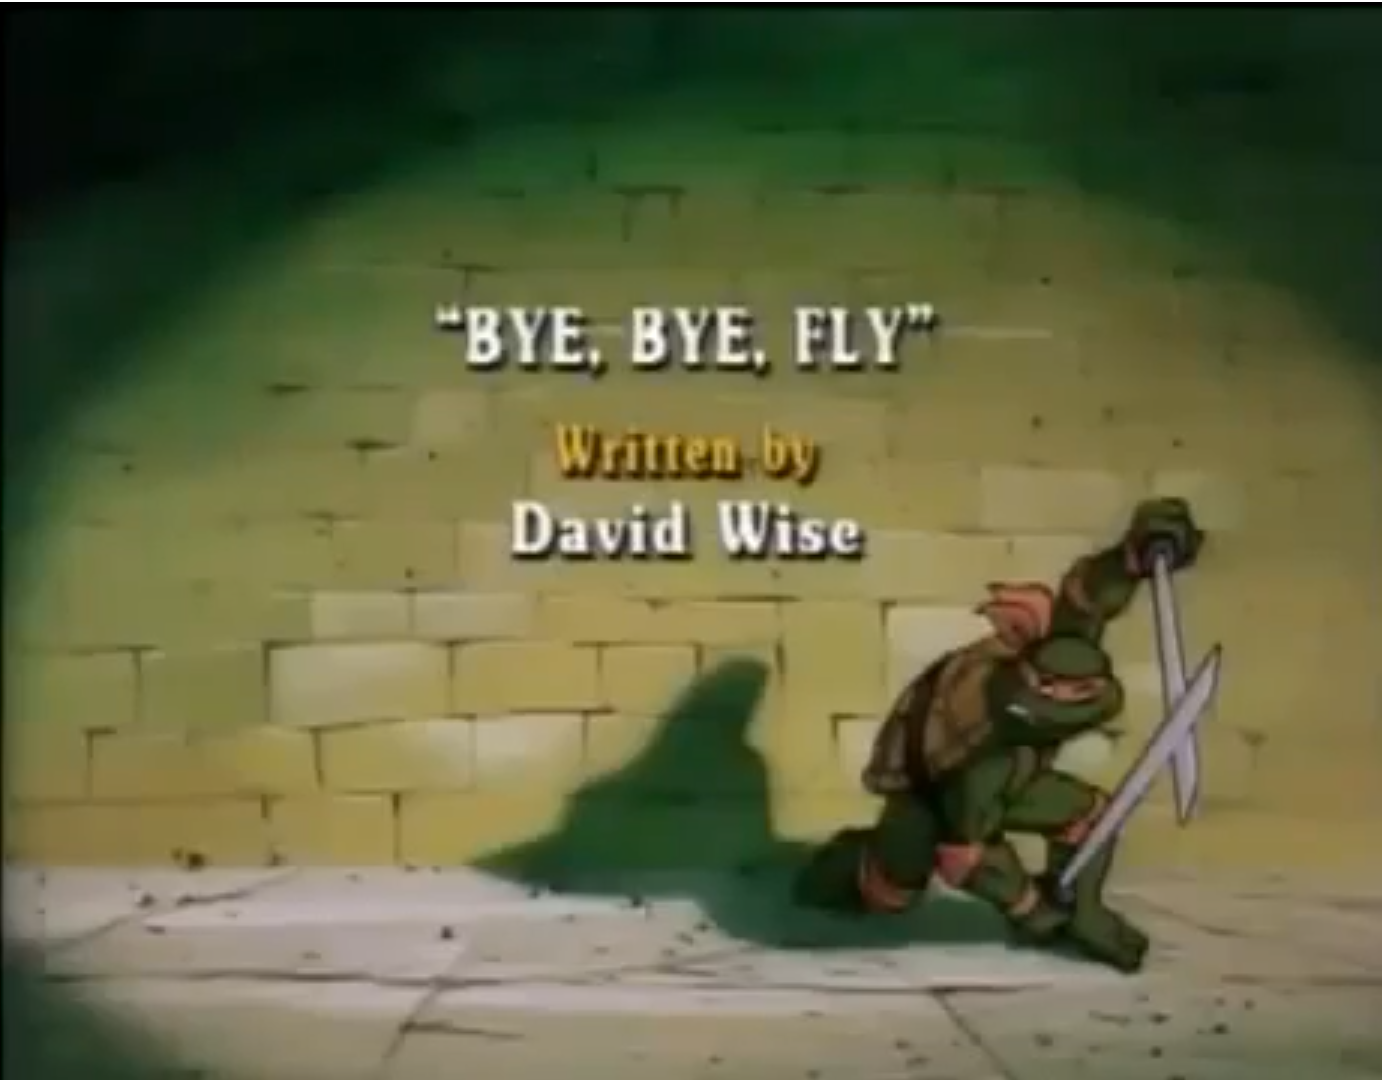 Bye, Bye, Fly